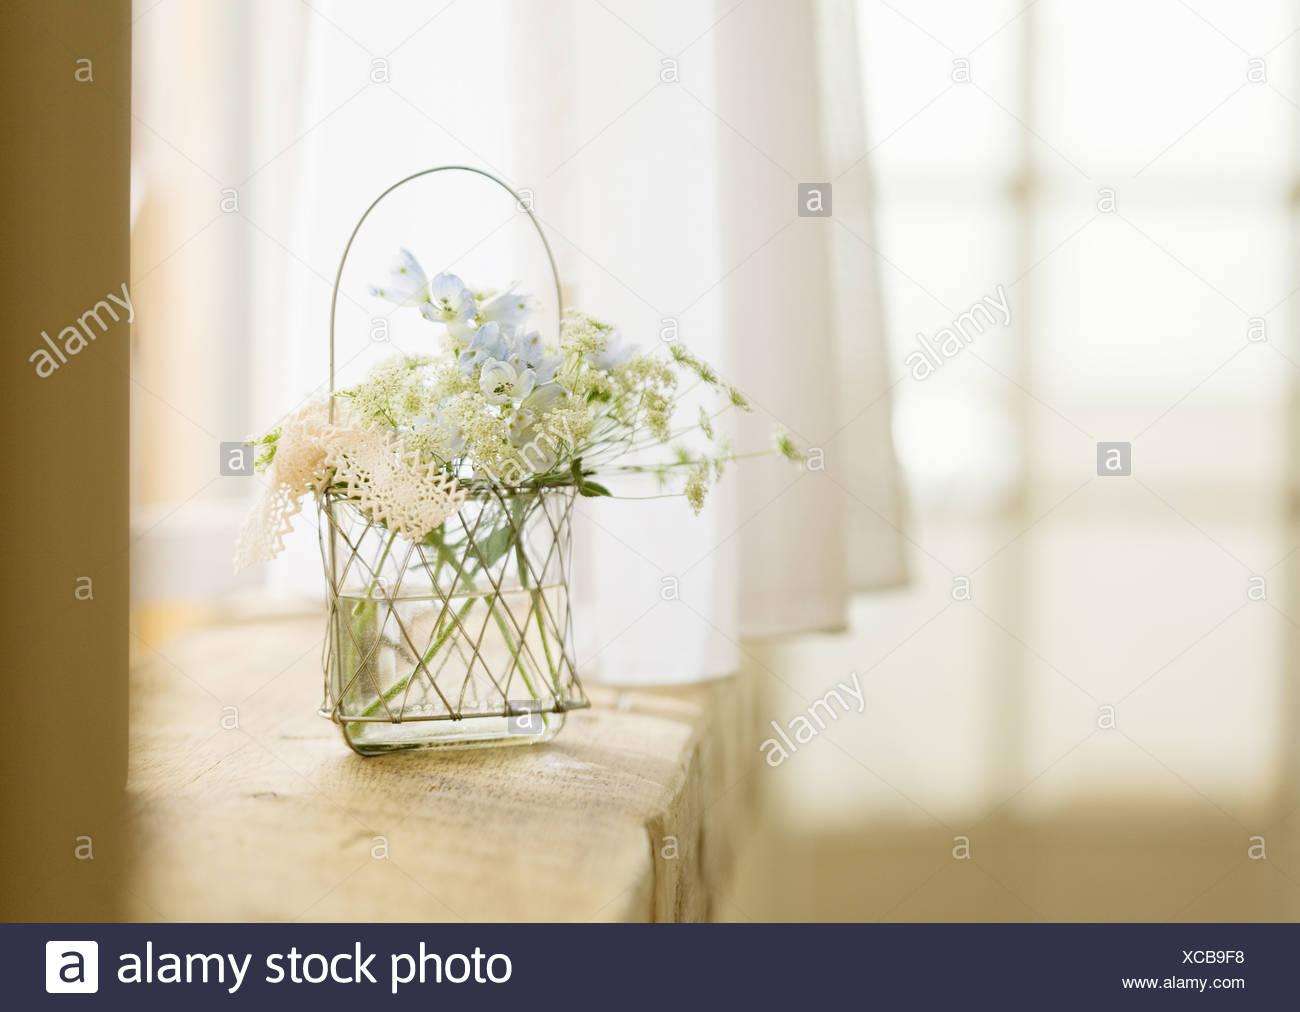 Flower arrangement - Stock Image